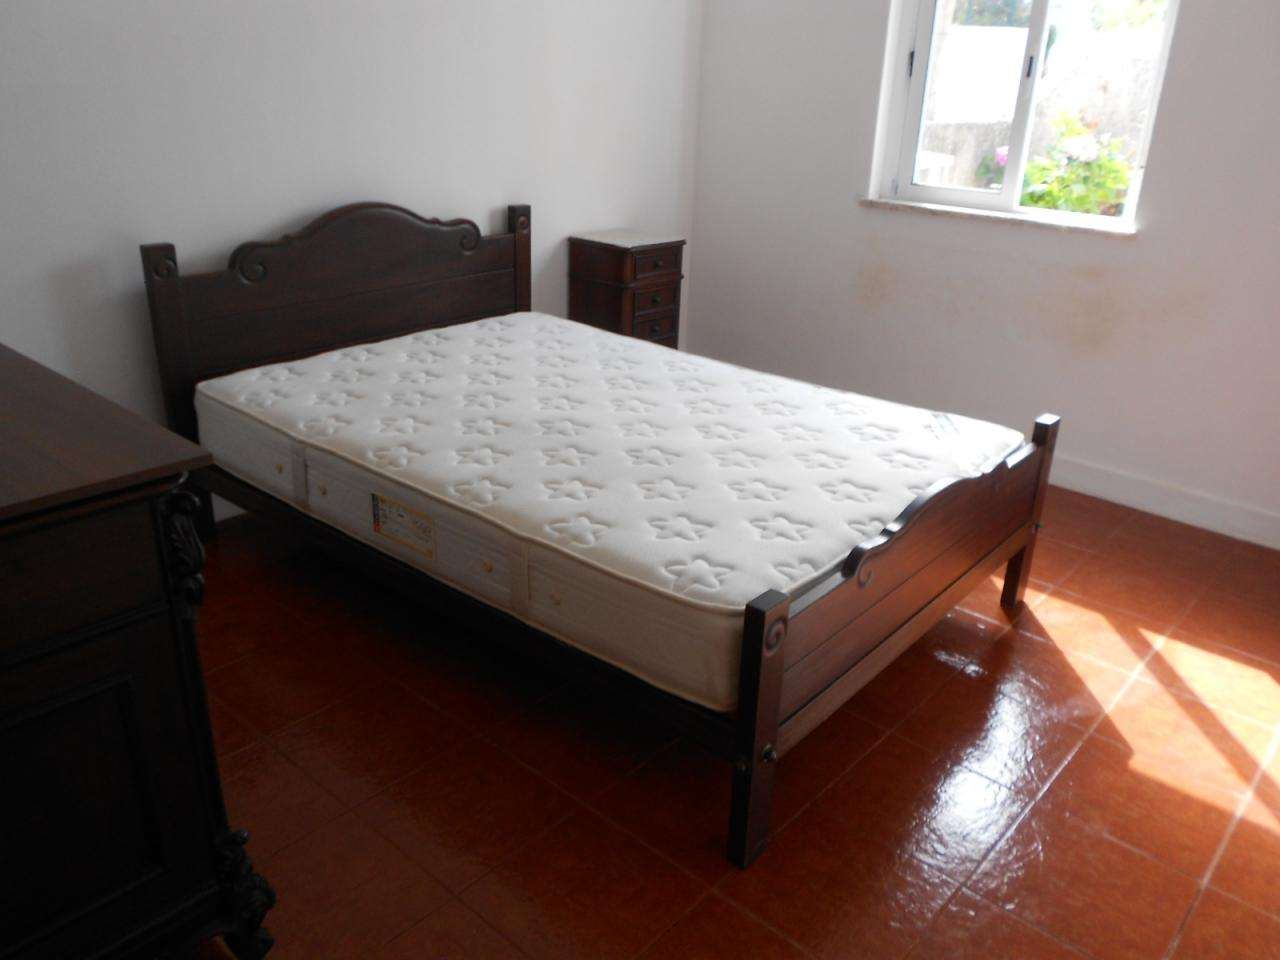 Moradia para arrendar, Tavarede, Coimbra - Foto 2